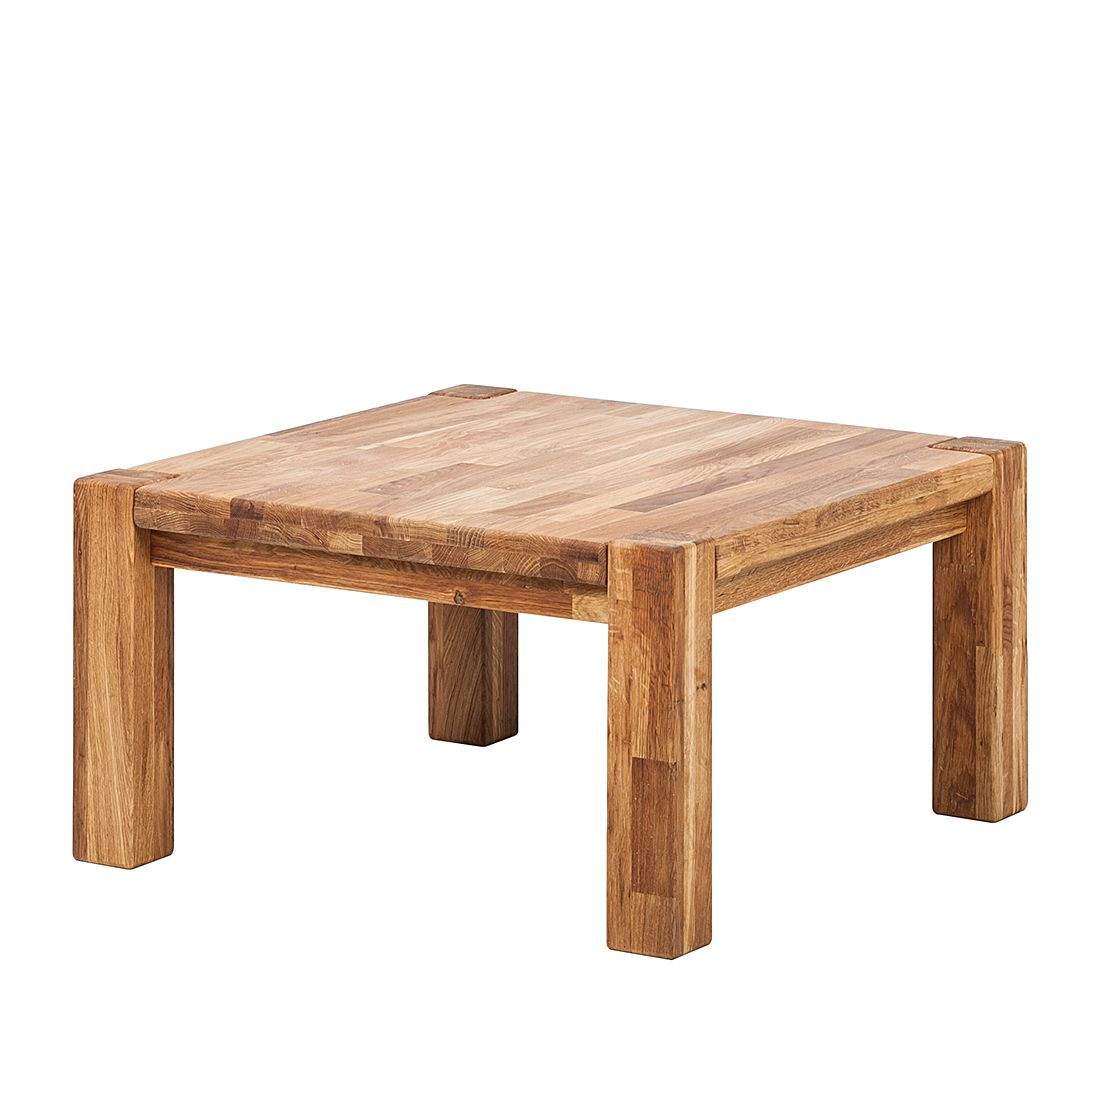 Image of Tavolino da salotto RichWOOD I, Ars Natura